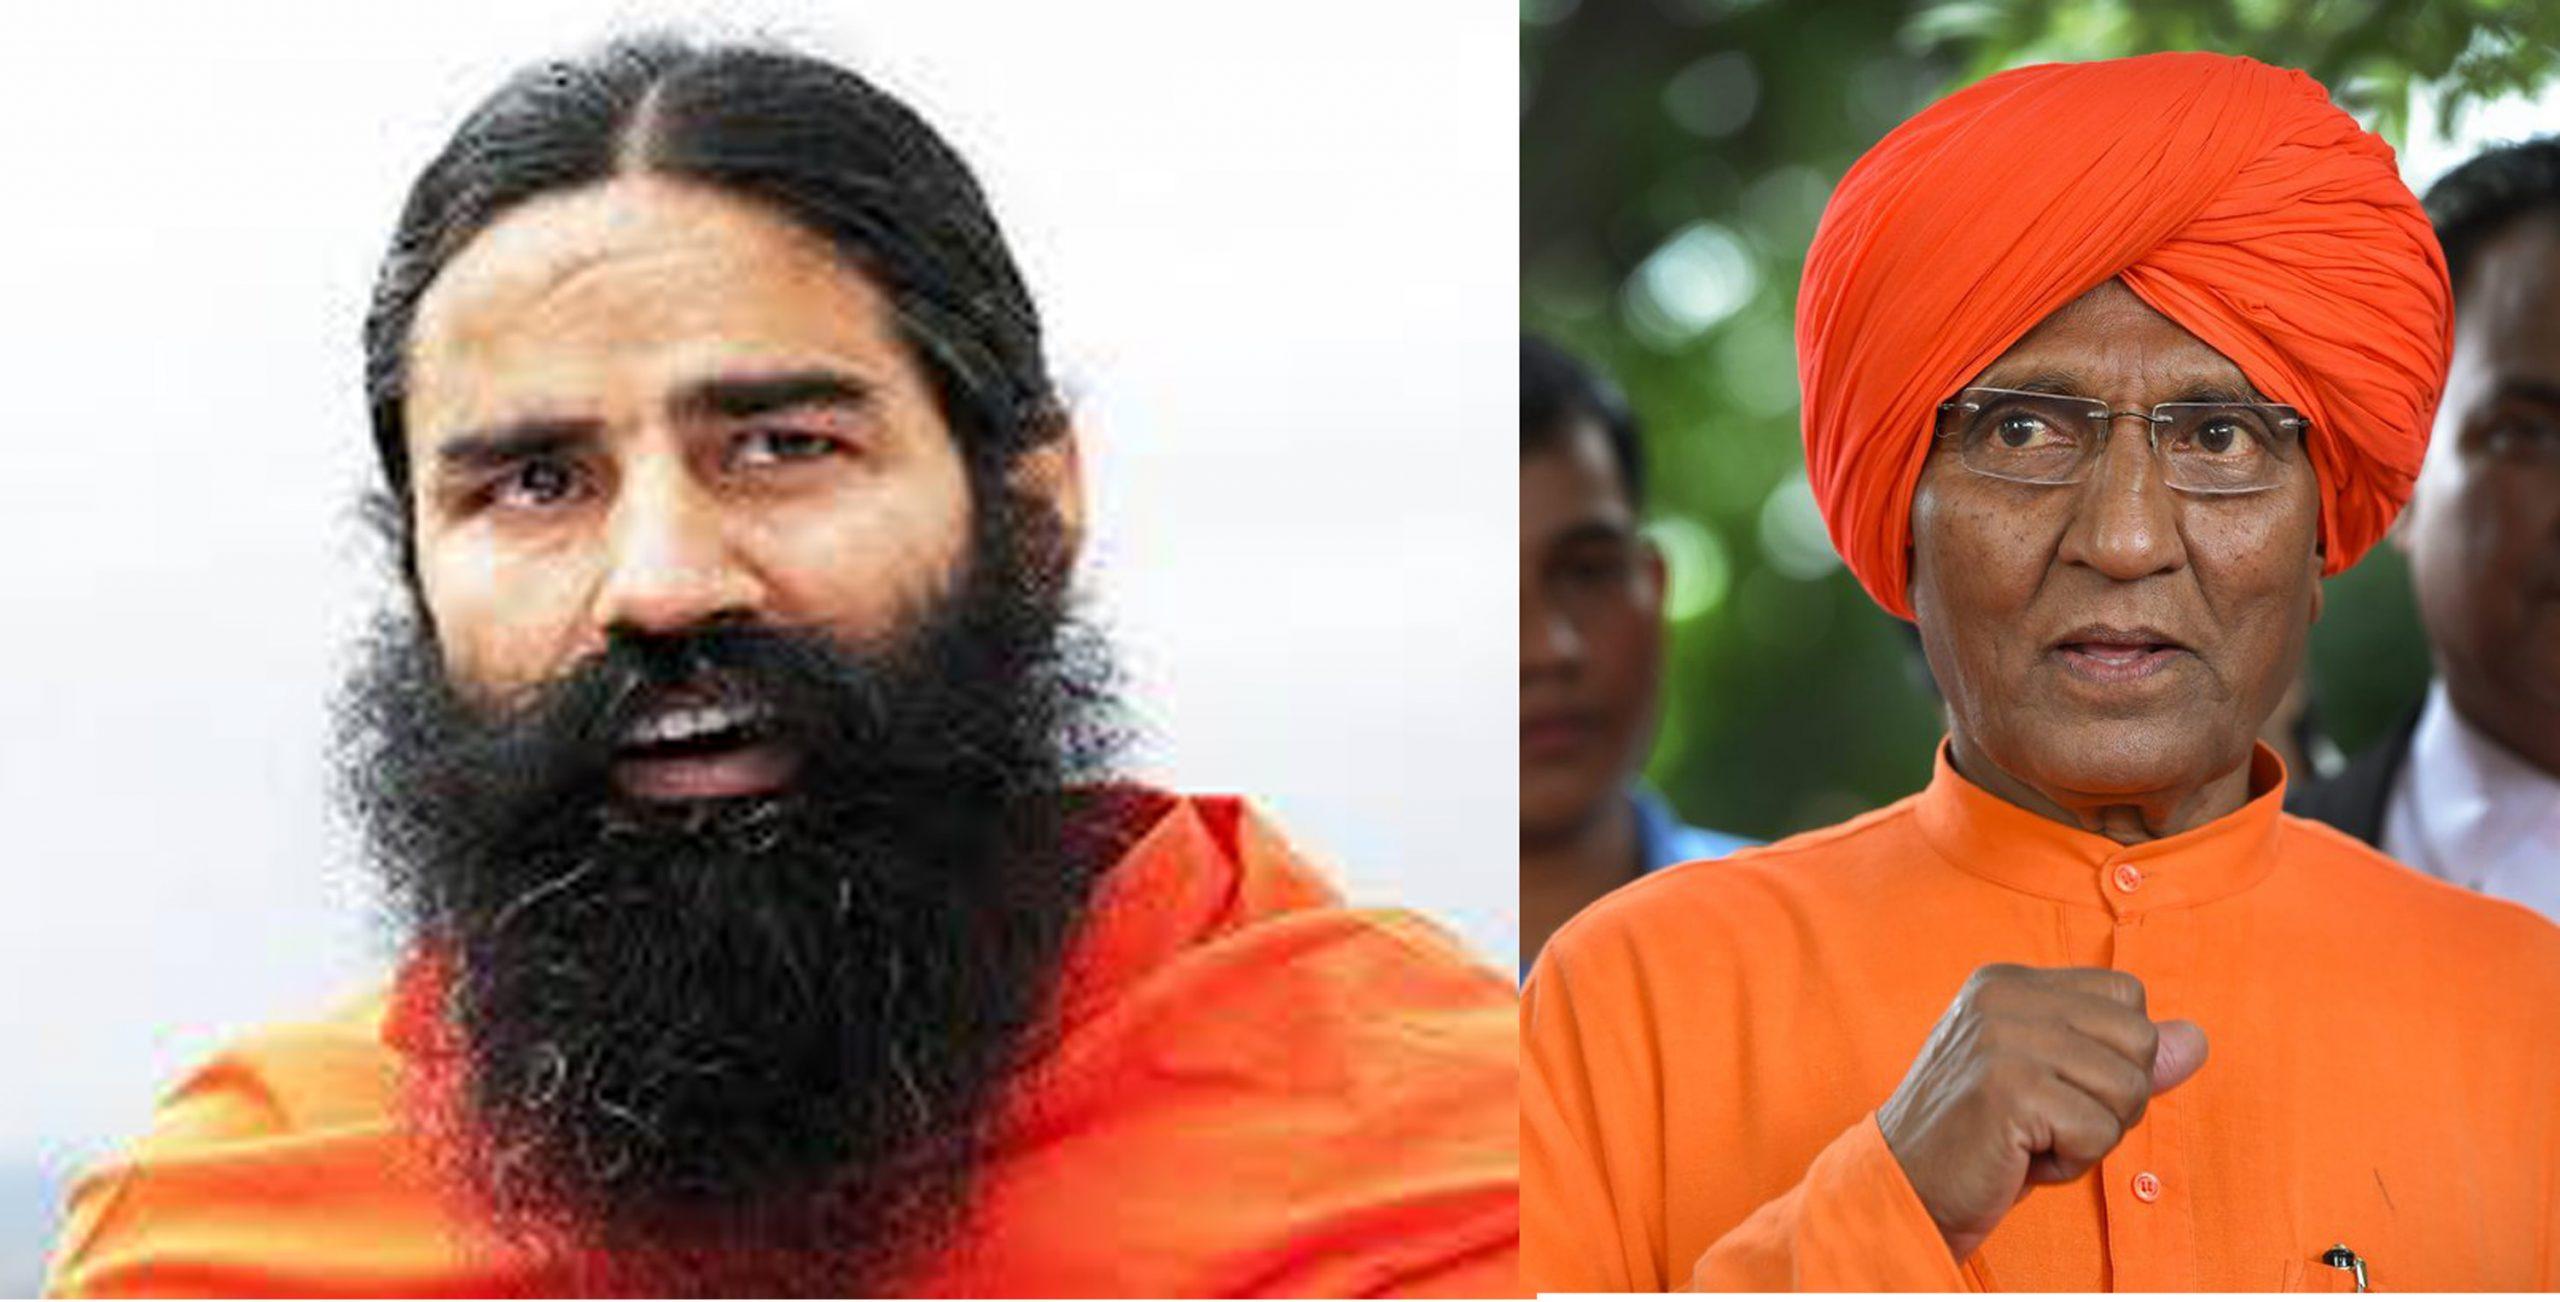 Baba Ramdev and Swamy Agnivesh